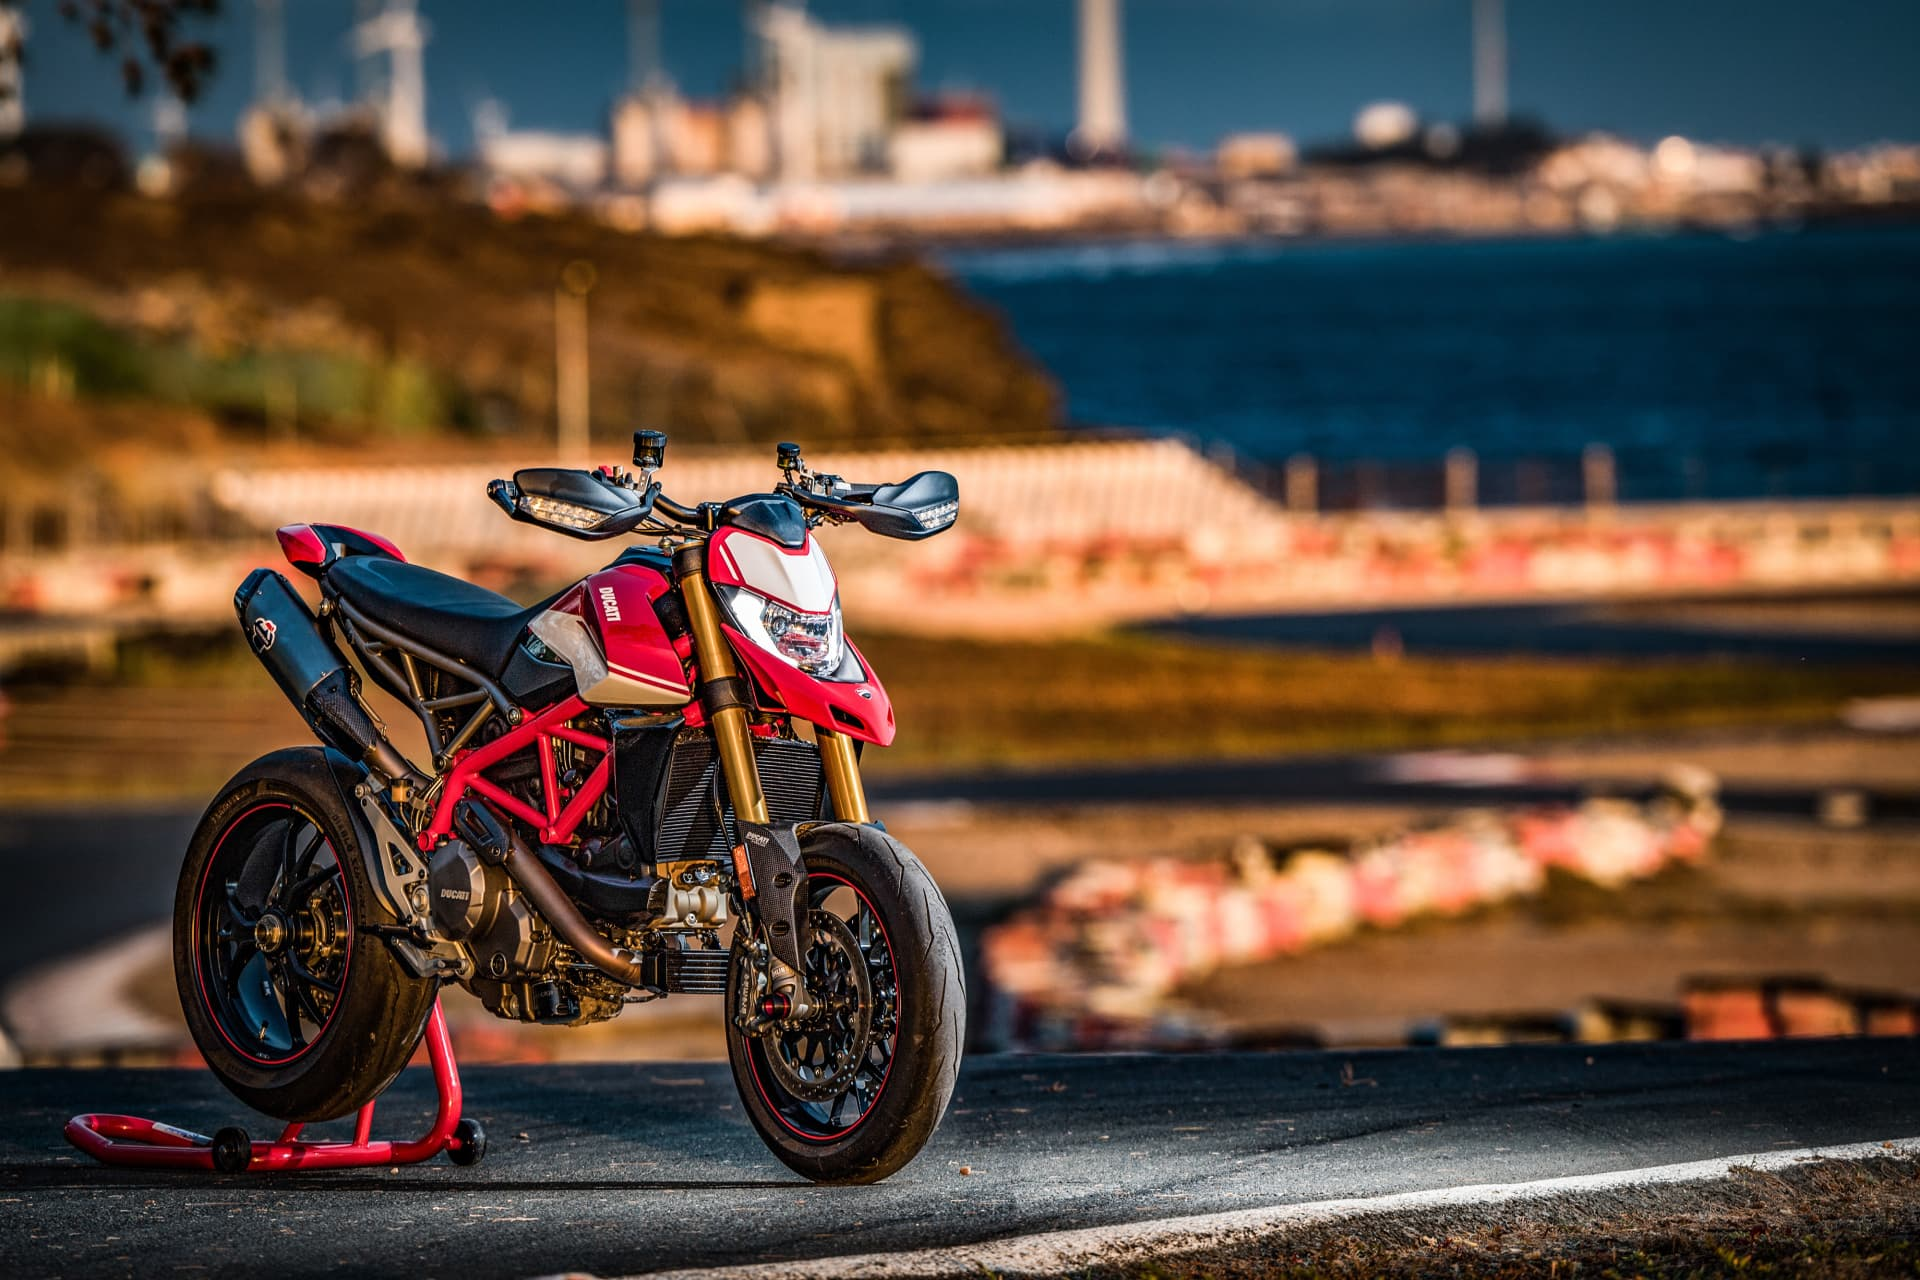 Ducati Hypermotard 950 Sp Static 08 Uc70309 Mid